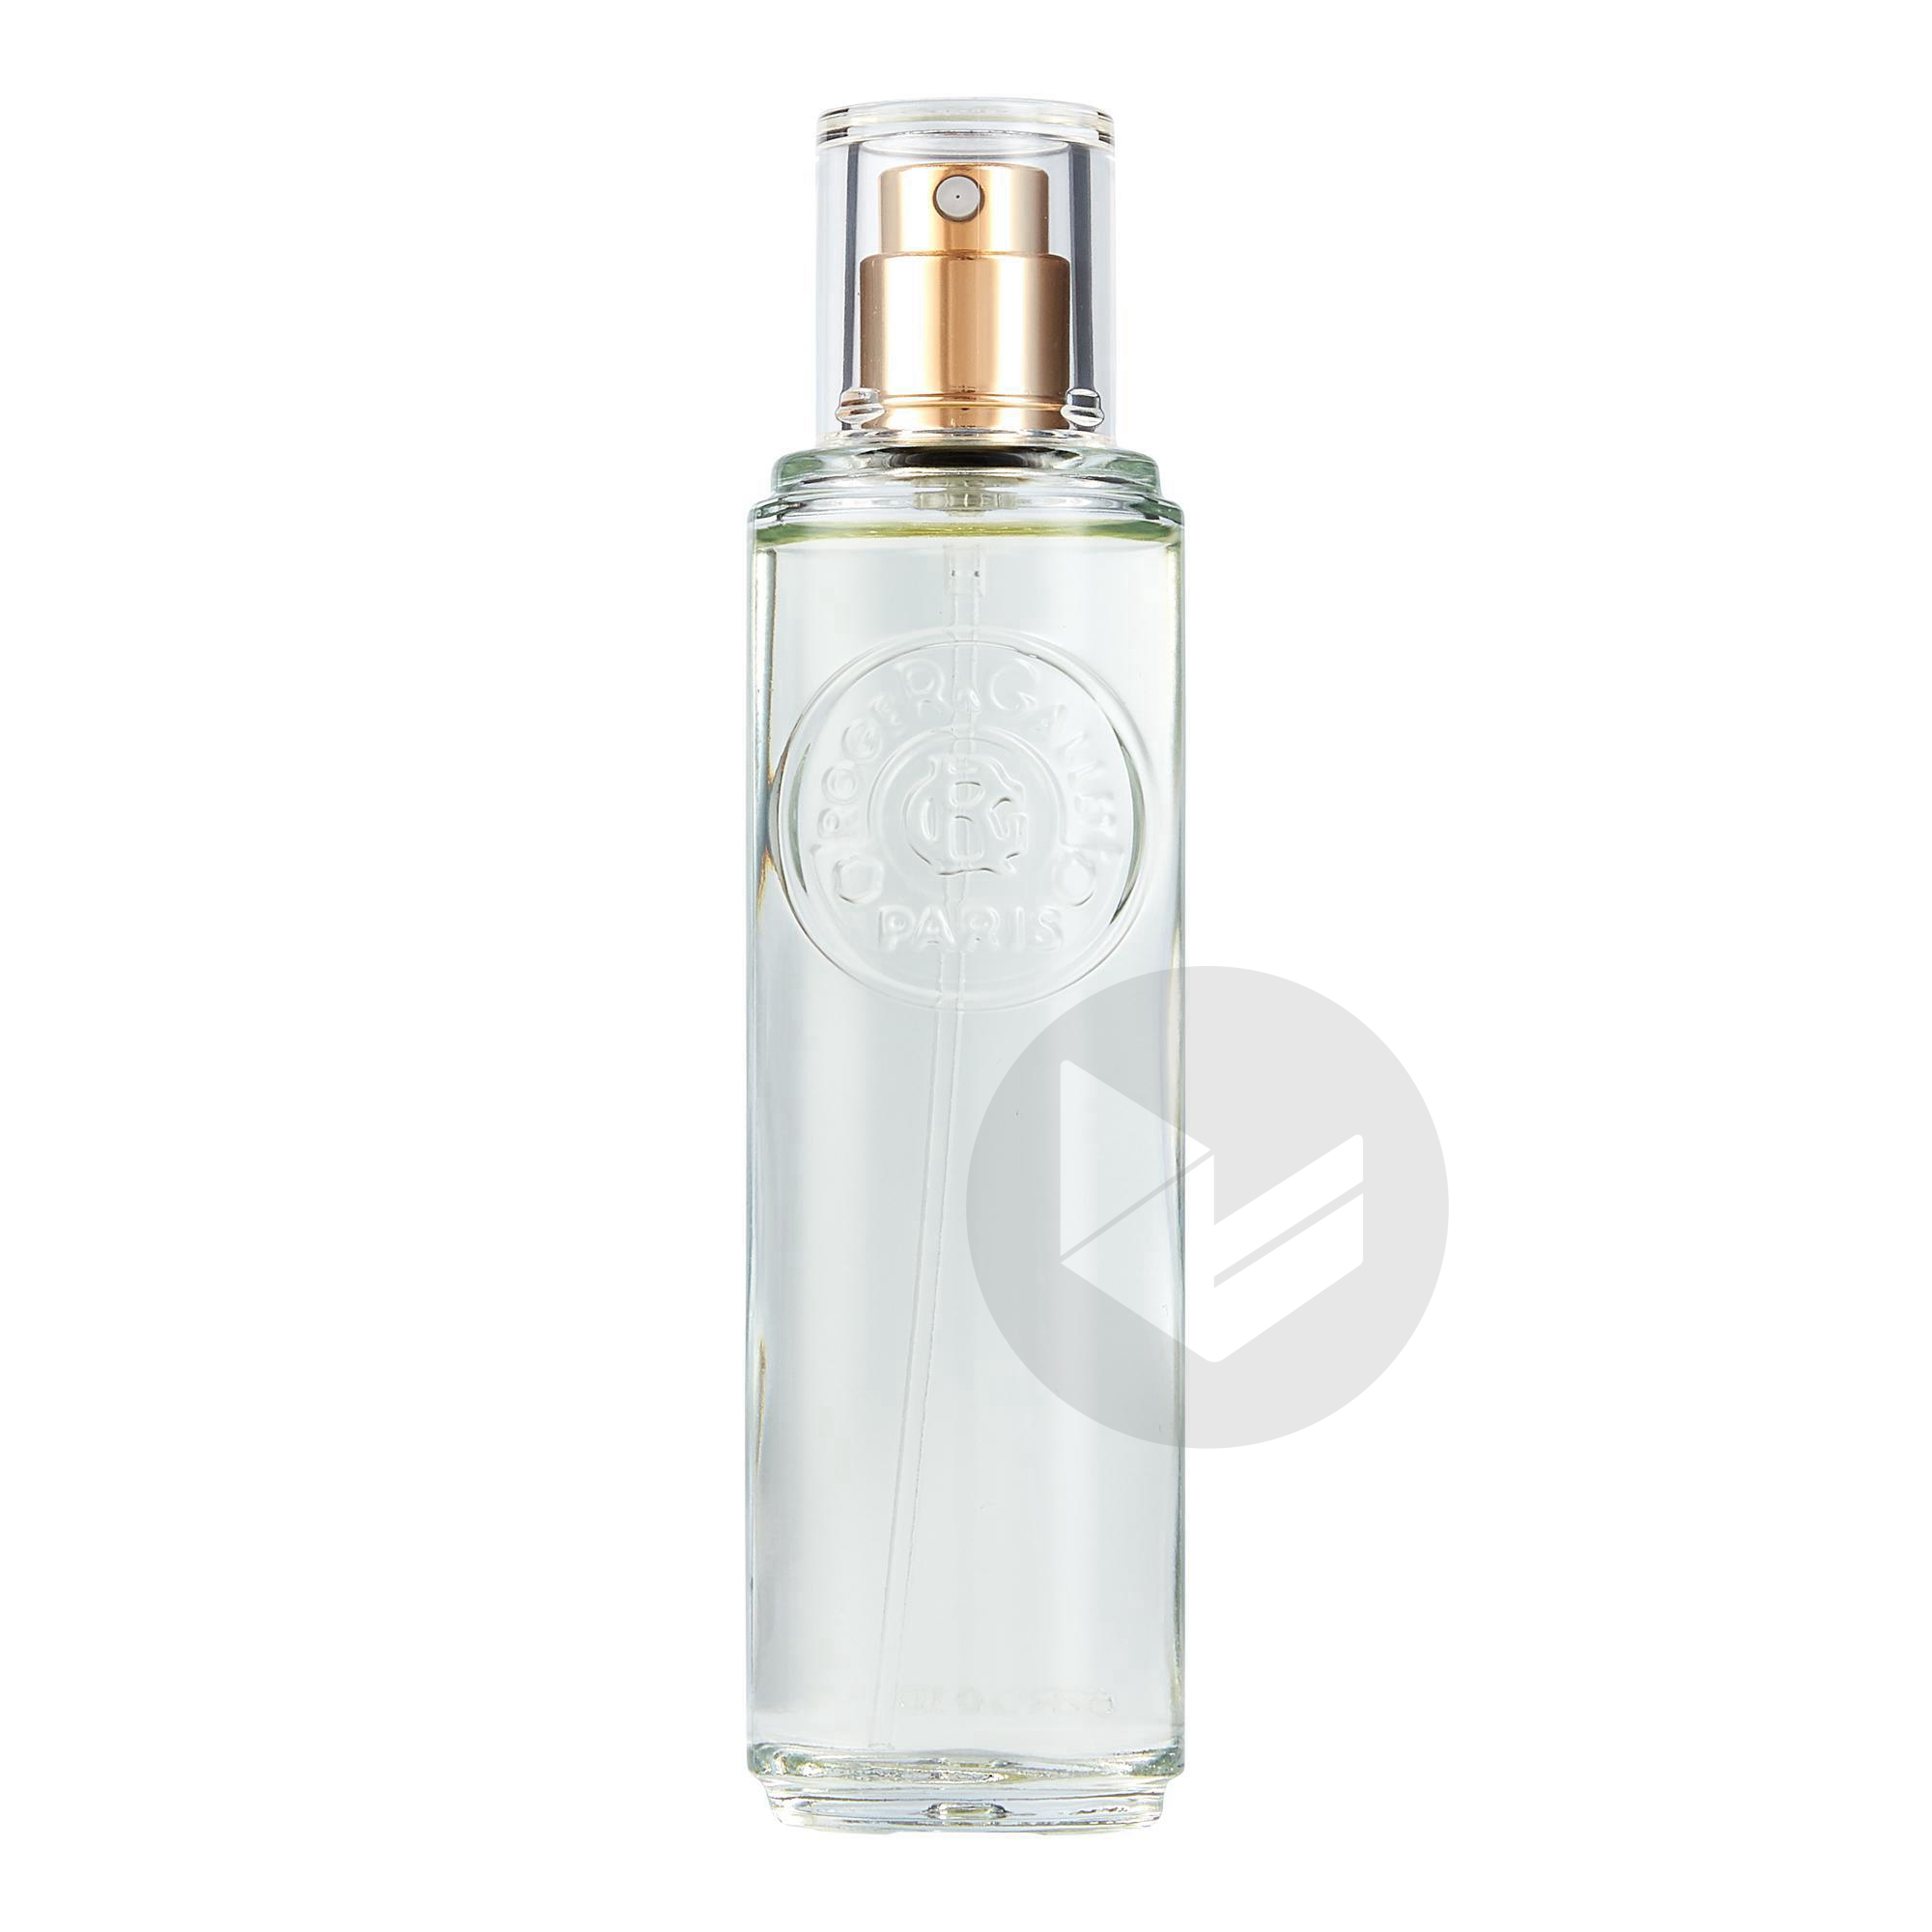 Cedrat Eau Fraiche Parfumee Bienfaisante Vaporisateur 30 Ml